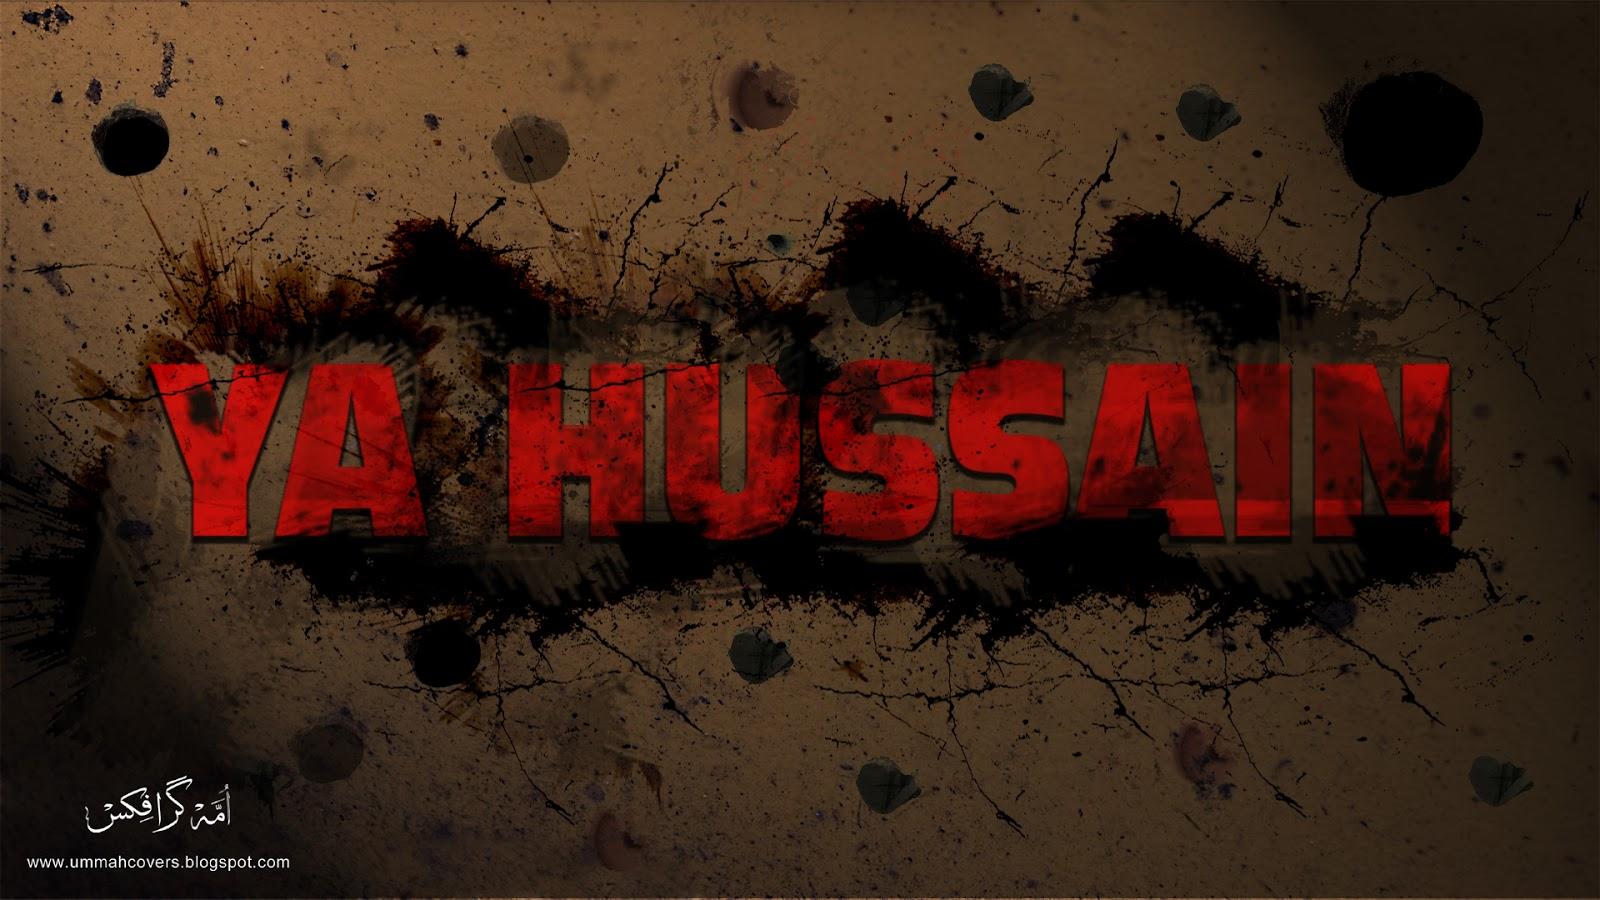 Hd wallpaper ya hussain - Http 4 Bp Blogspot Com 6lruggstpwa Ukzfqiy6yki Wallpaper Wallpaper Muharram Wallpapers Wallpaper Ya